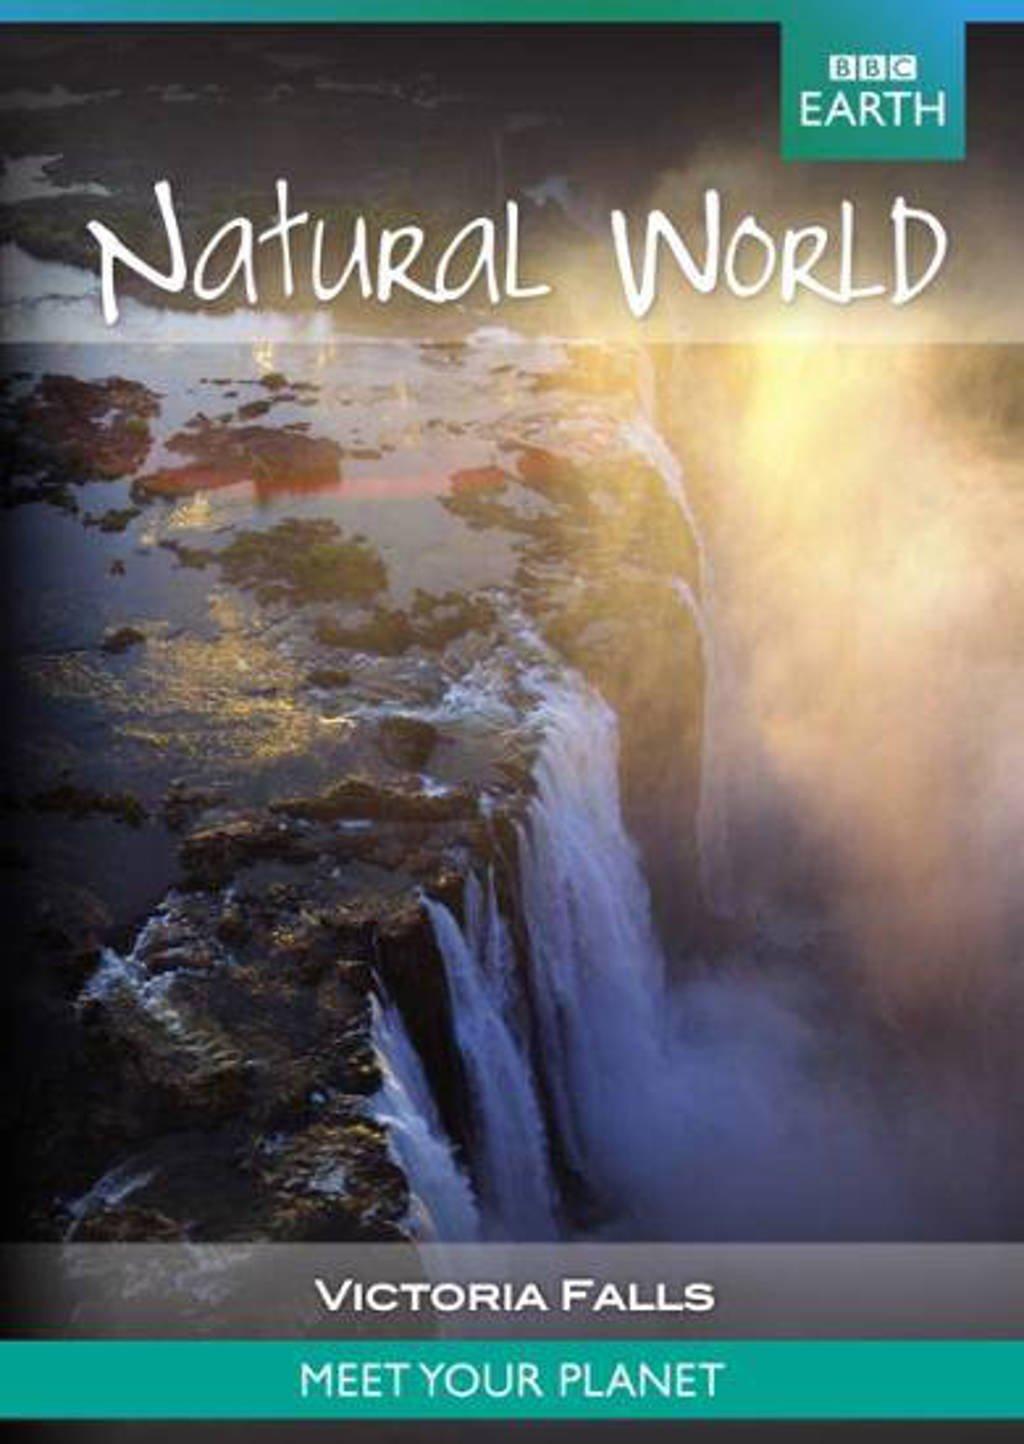 BBC earth - Natural world natural world collection Victoria Falls (DVD)